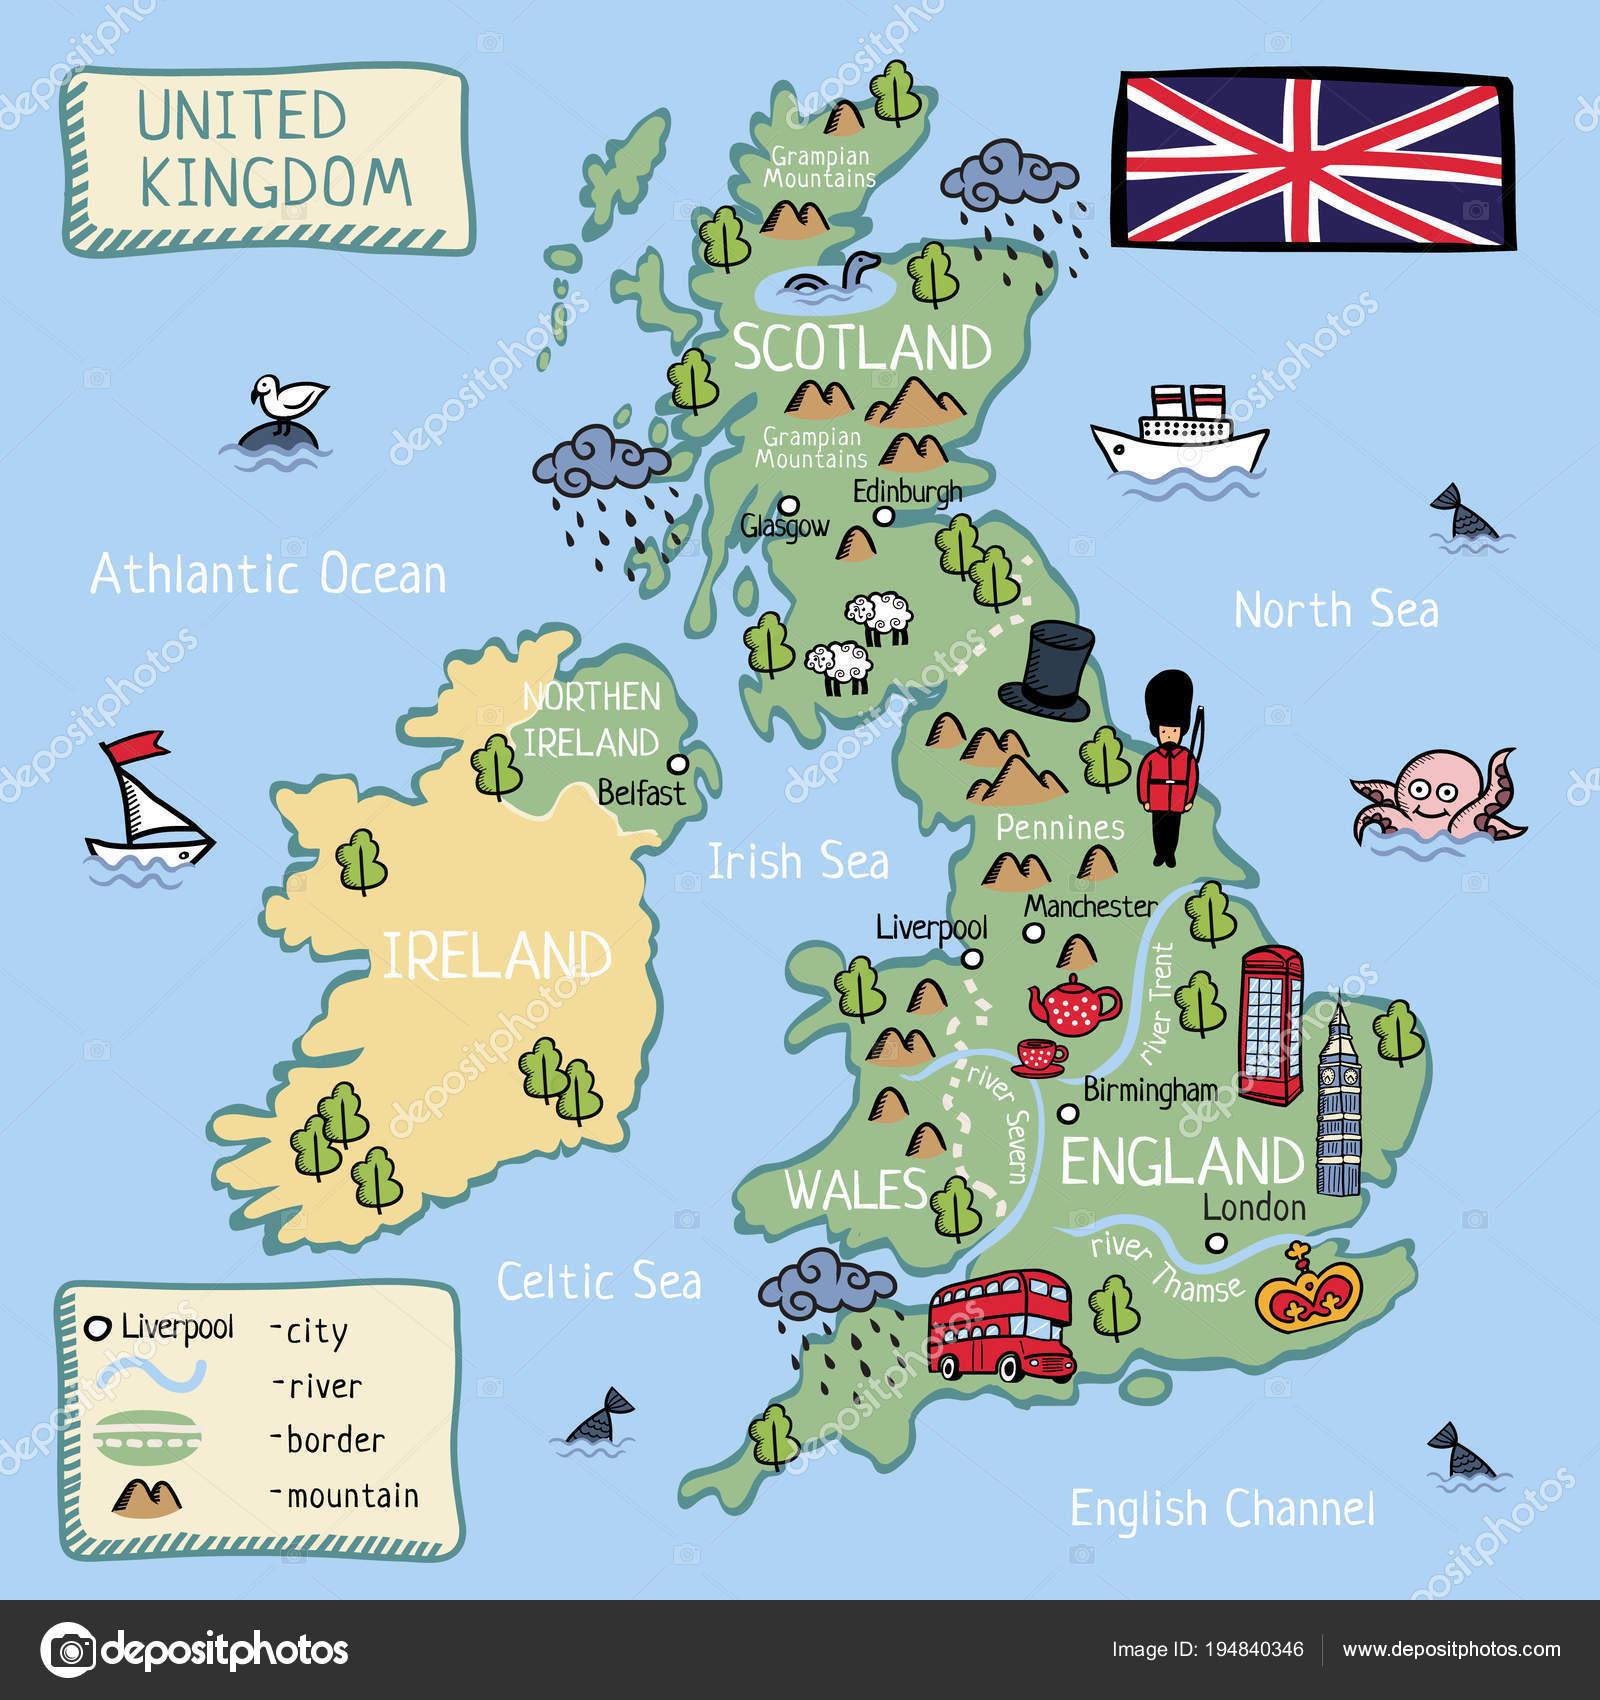 Carte Angleterre Ecosse.Dessin Anime Carte Vectorielle Royaume Uni Angleterre Ecosse Puits